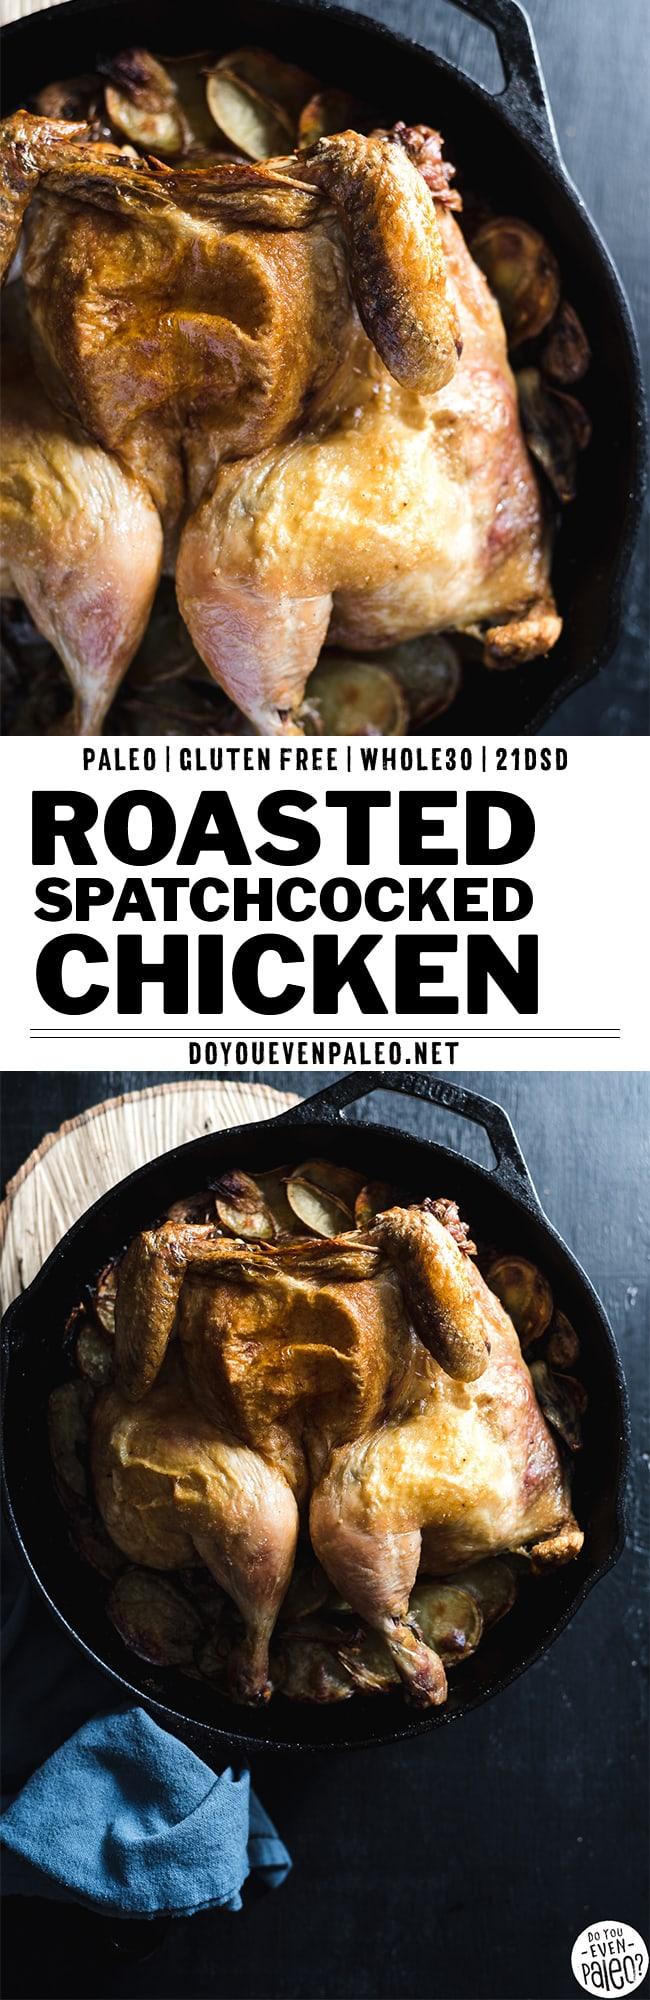 Paleo & Whole30 Spatchcocked Roast Chicken with Potatoes Recipe | DoYouEvenPaleo.net